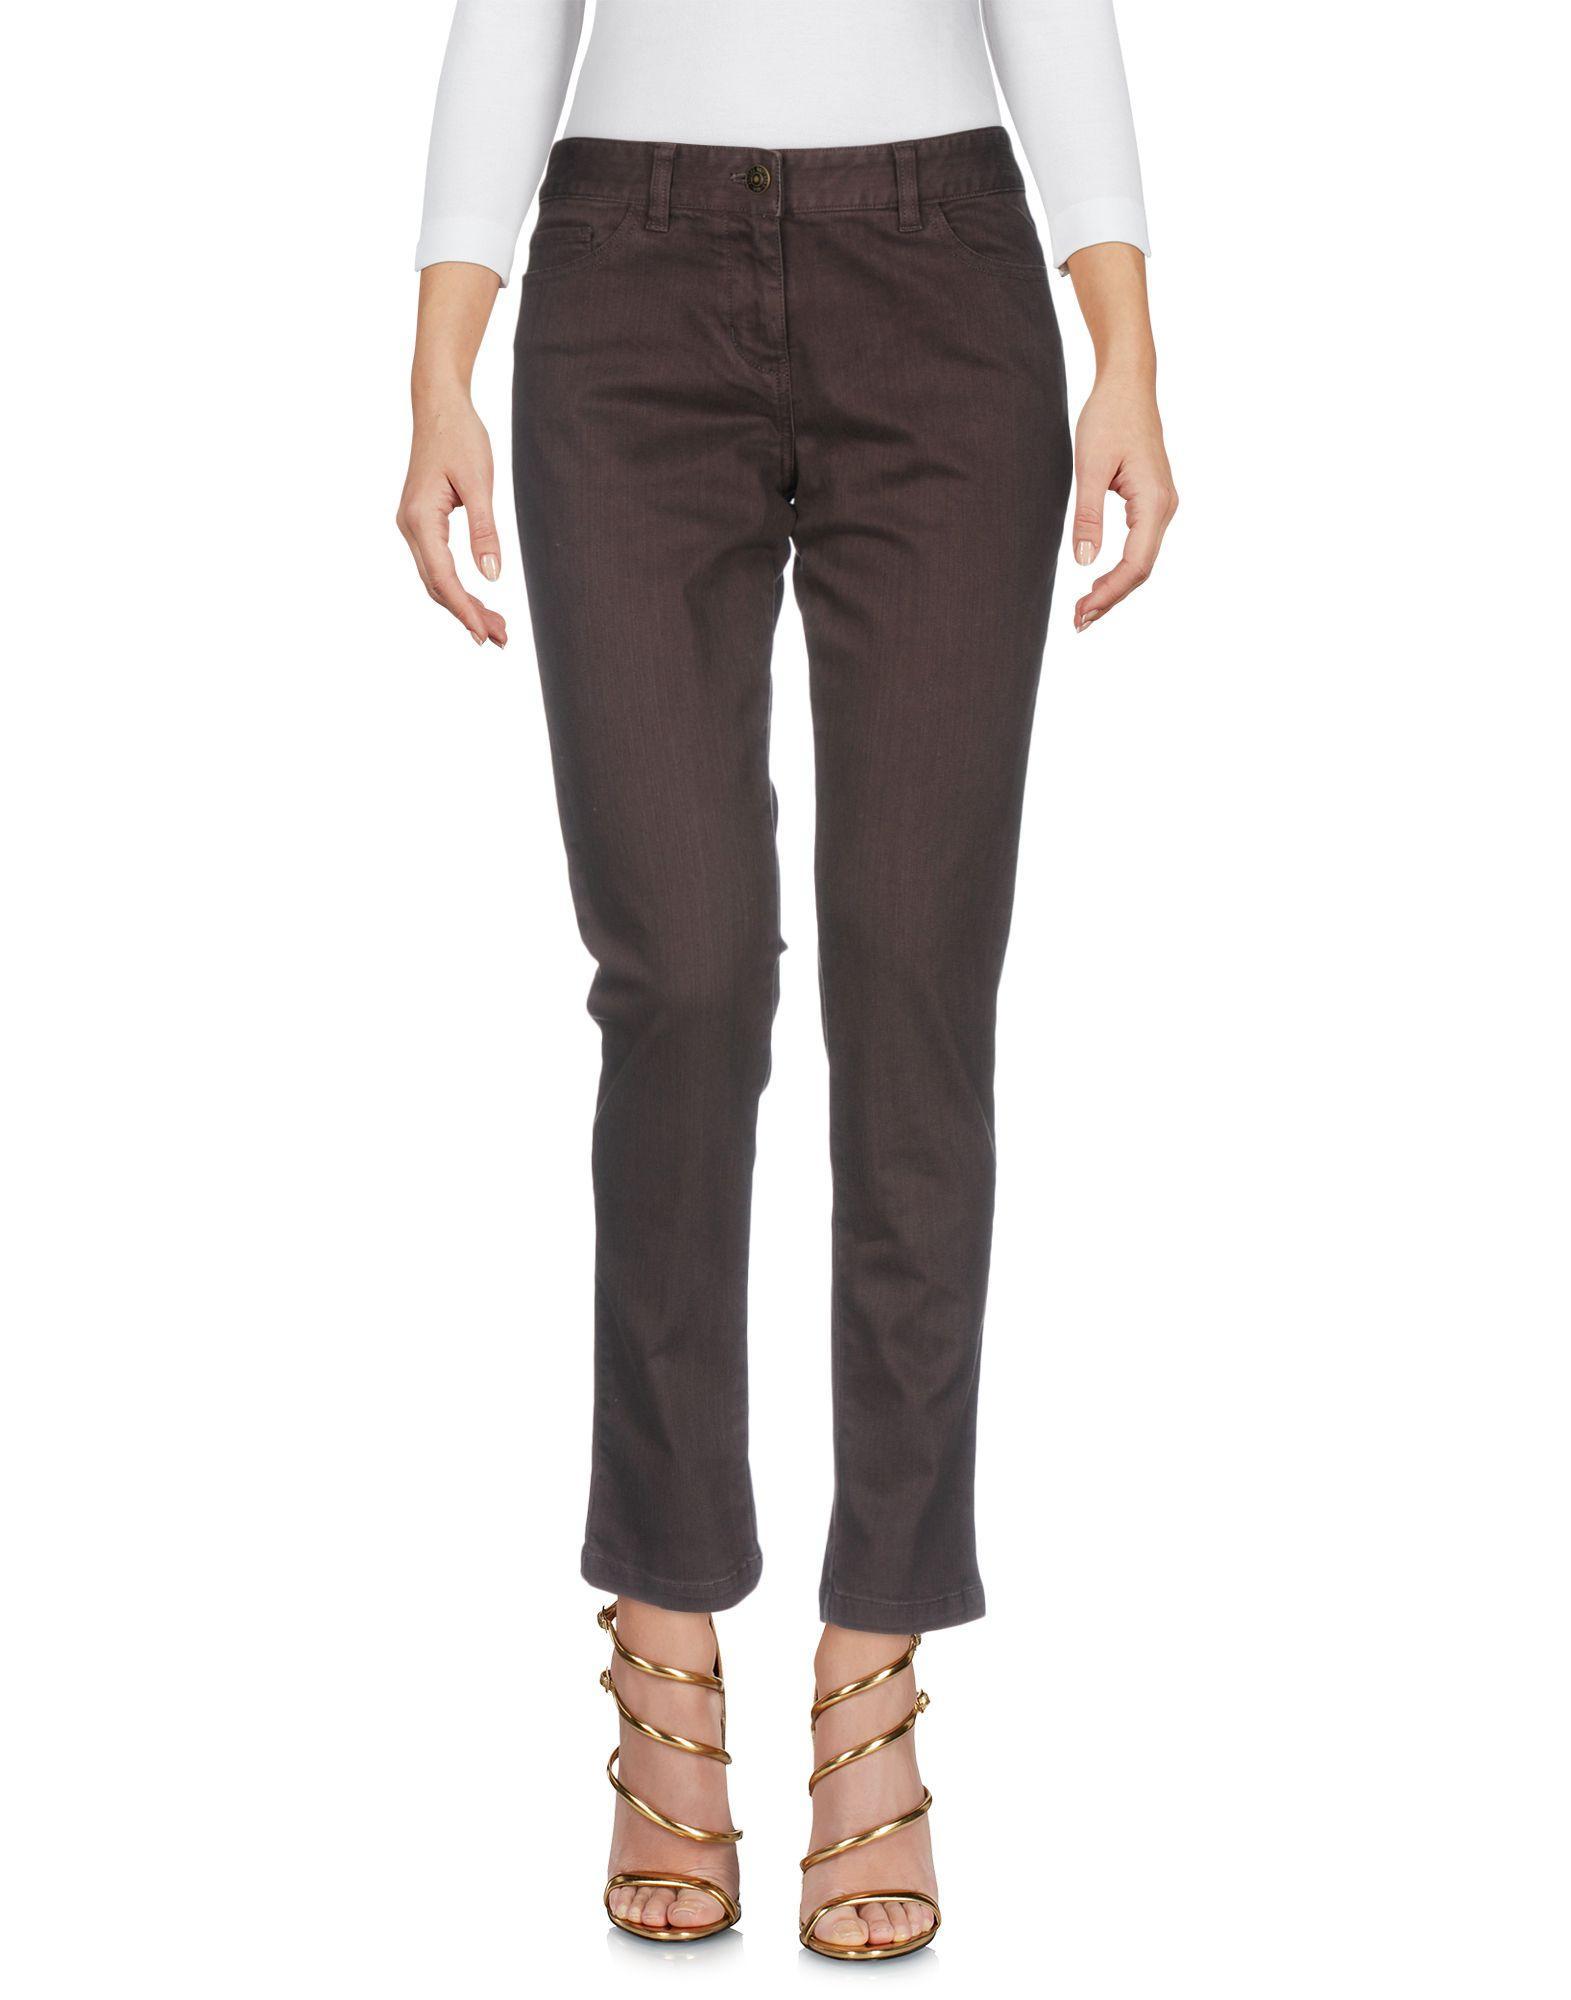 Brooks Brothers Jeans In Dark Brown